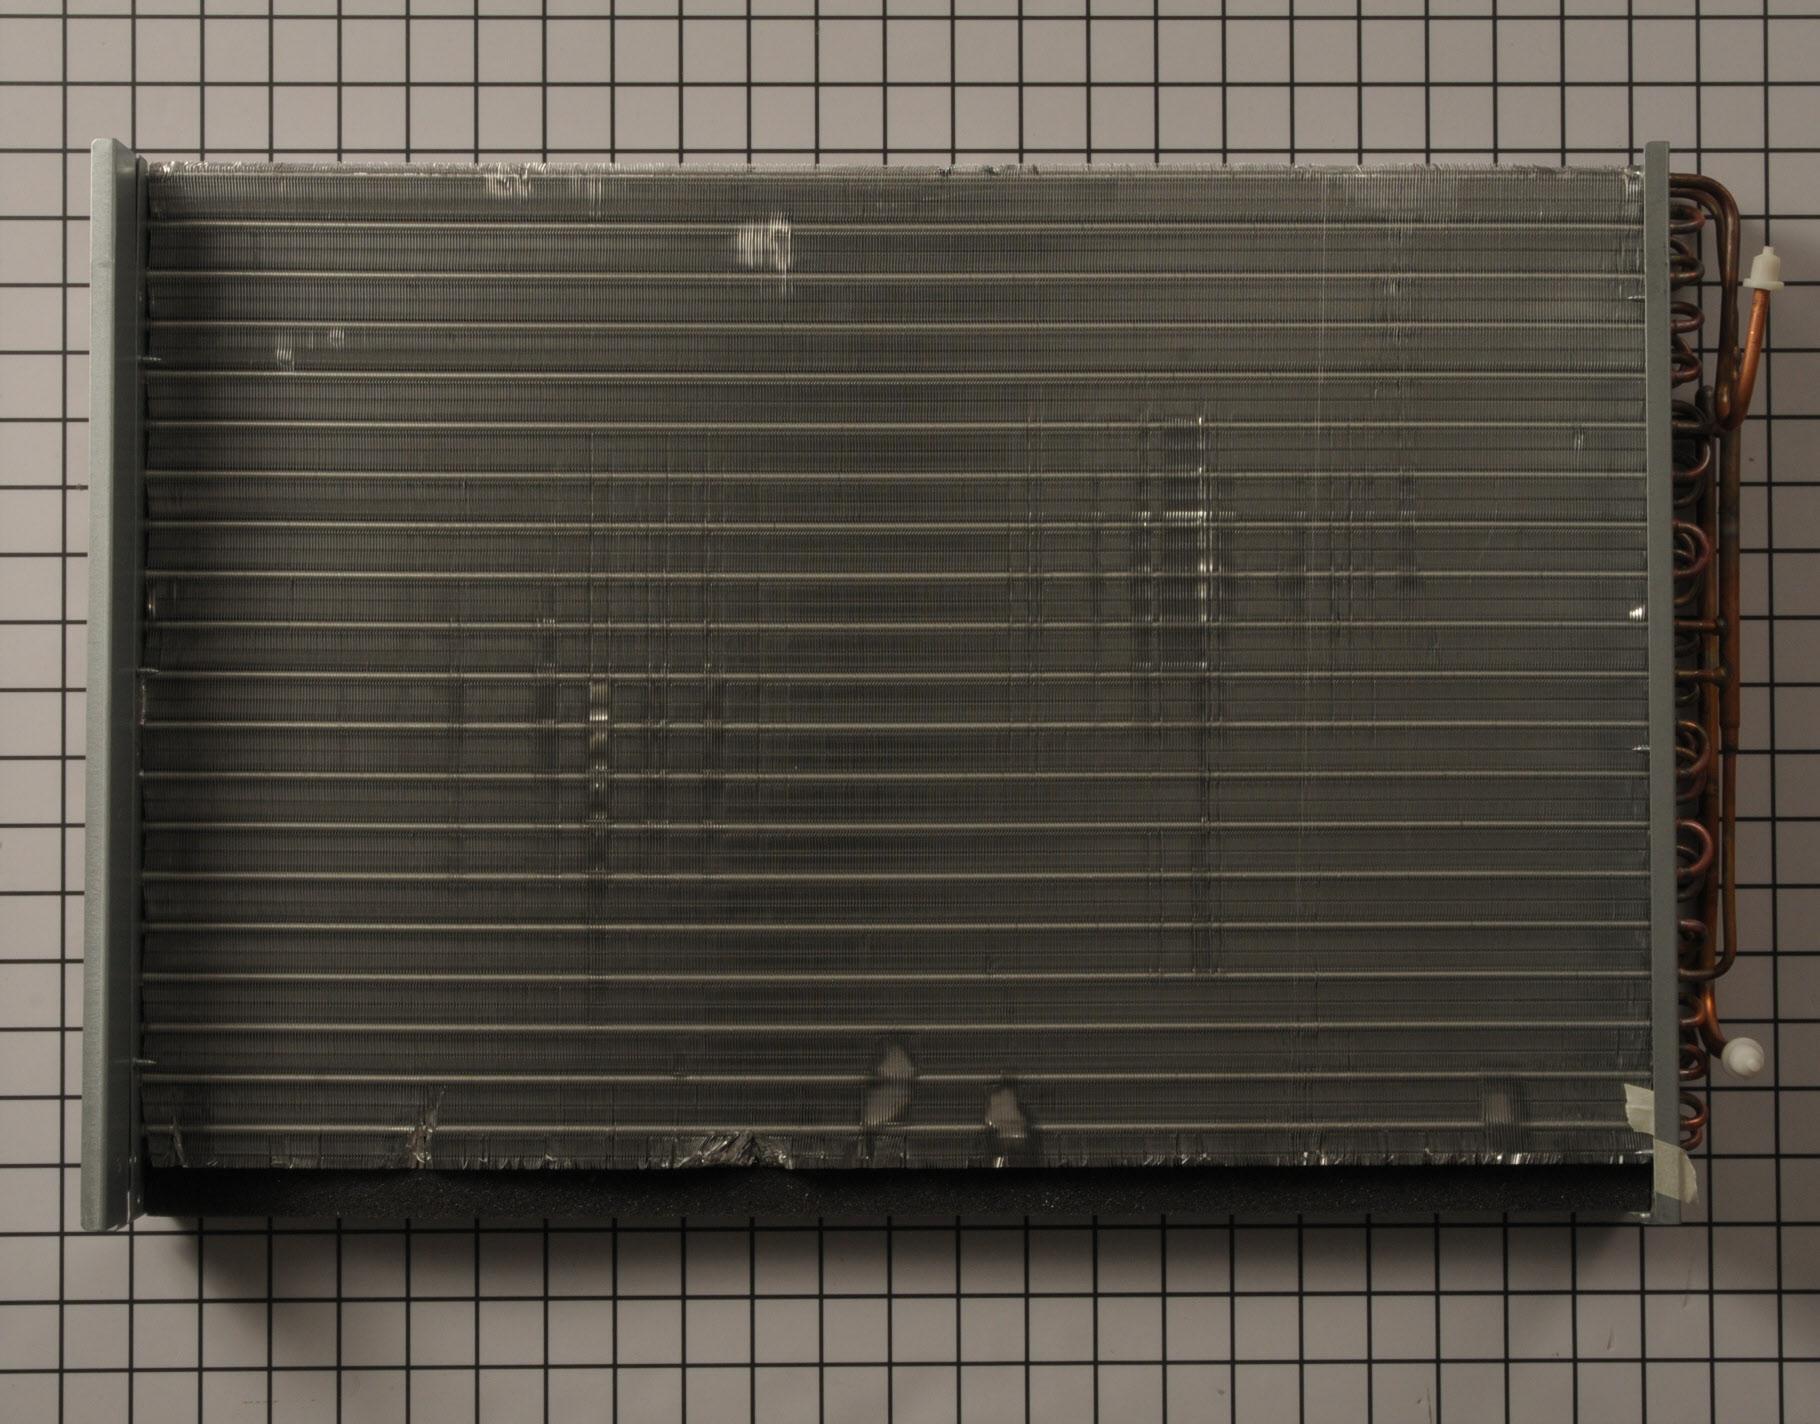 Kenmore Air Conditioner Part # 5304485989 - Condenser